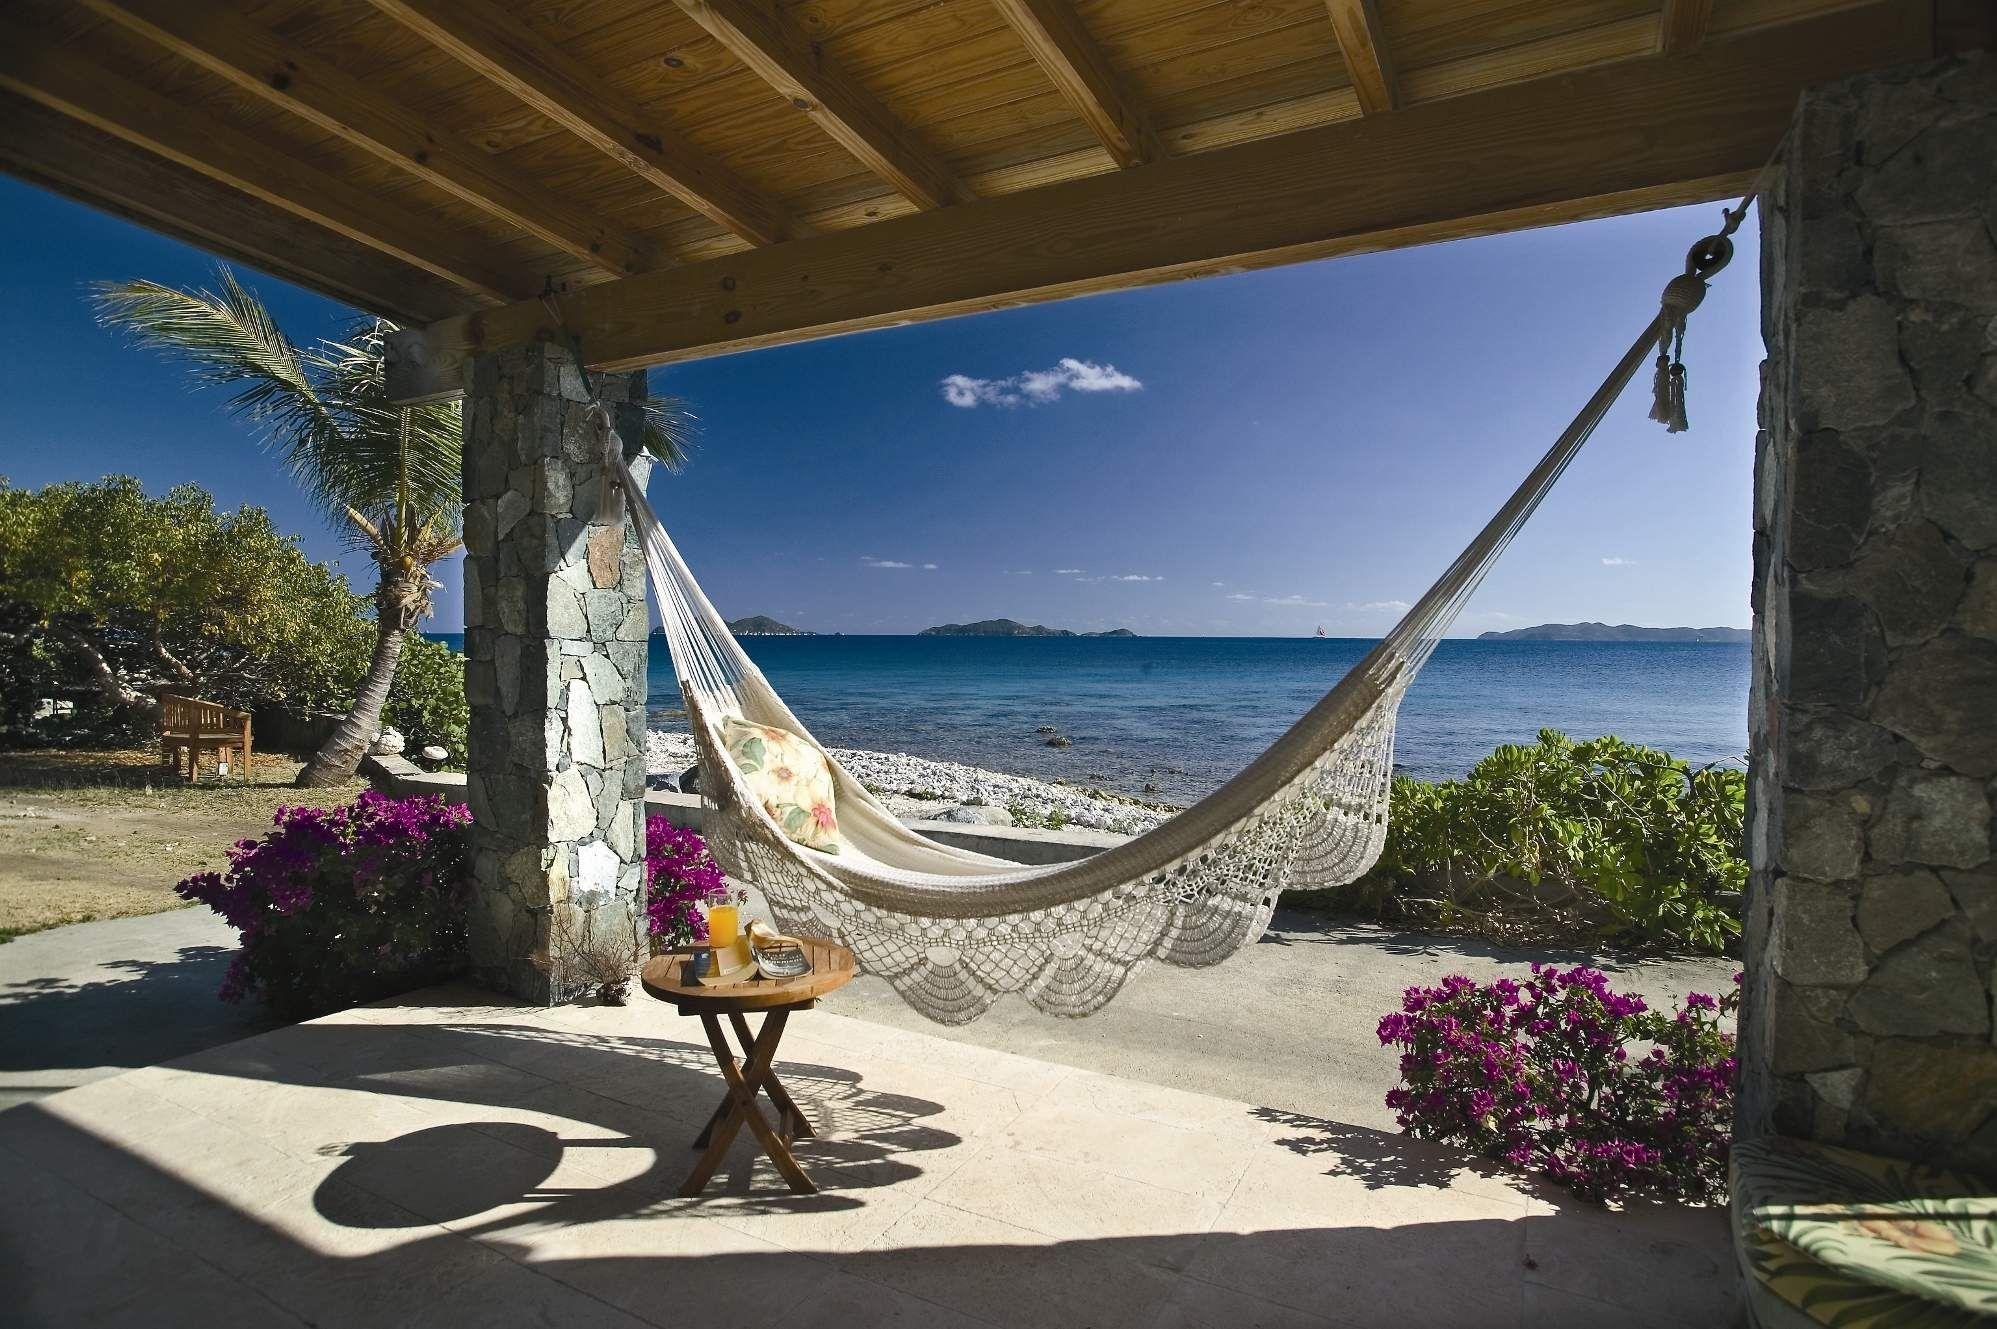 beachside hammock summer beach view hammock nap patio beach house beachside hammock summer beach view hammock nap patio beach house      rh   pinterest